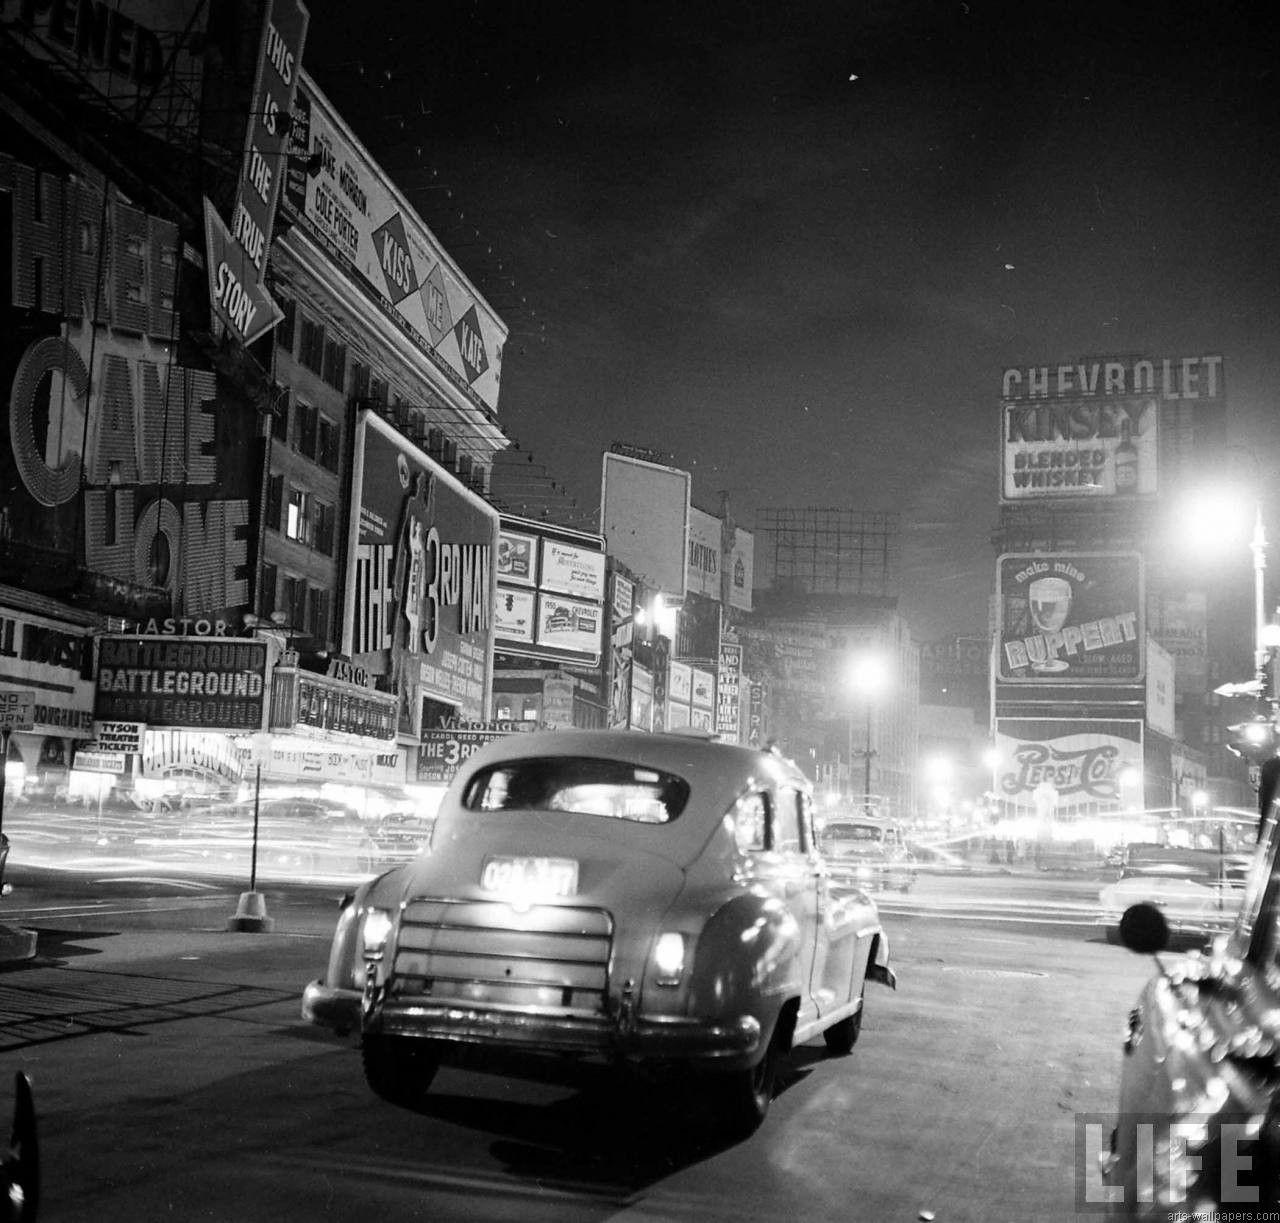 photographs classics | Old New York Photos, Prints, Photography, Classic, Retro, New York ...